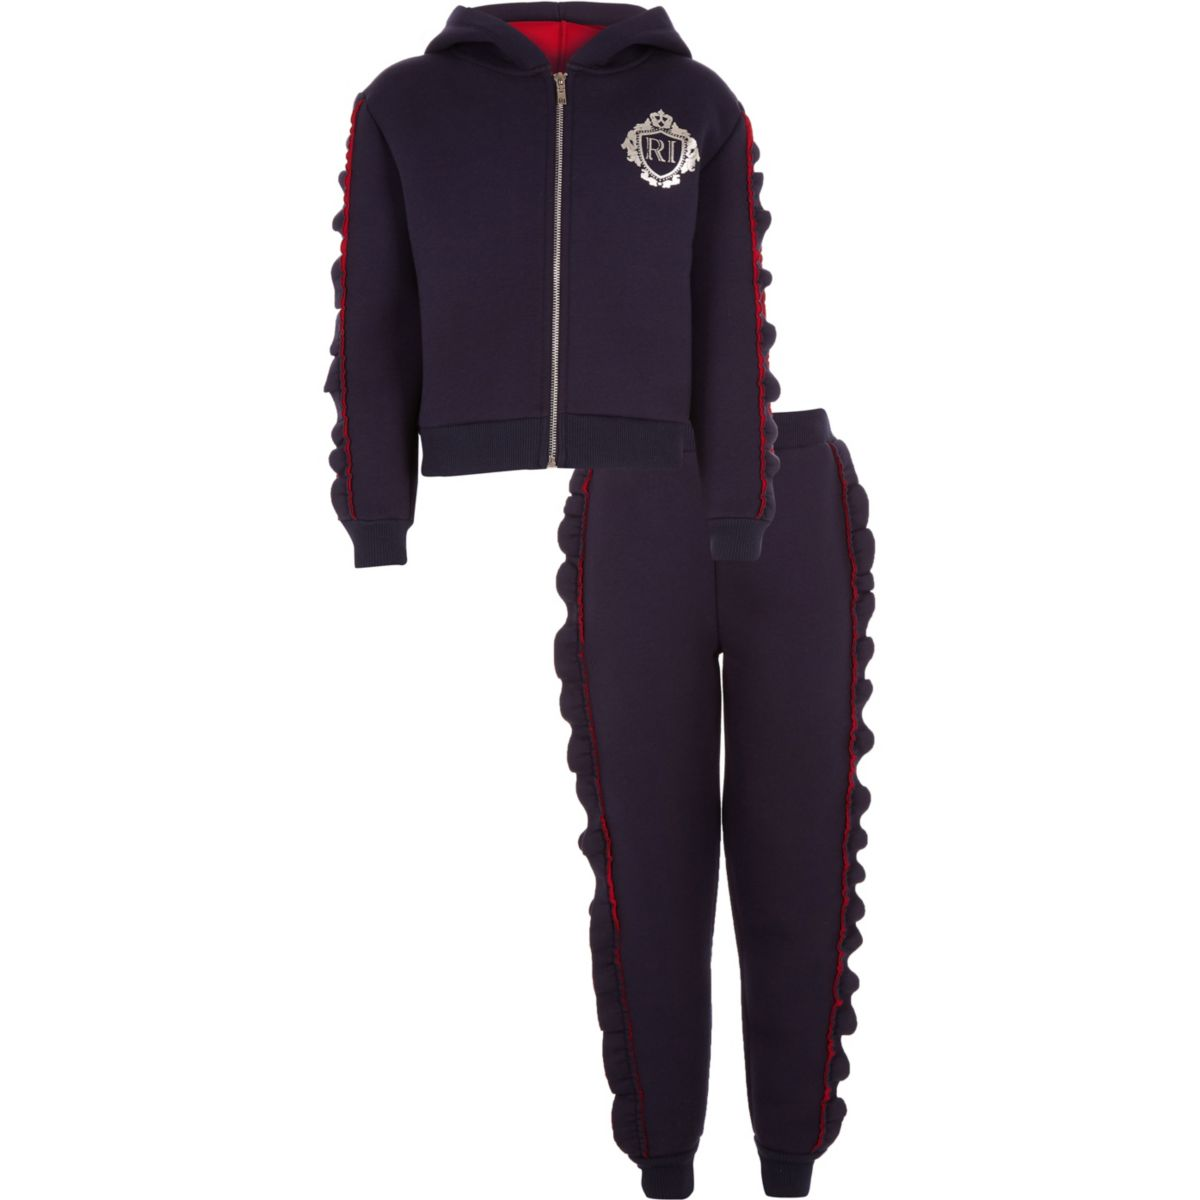 Girls rhinestone frill hoodie outfit